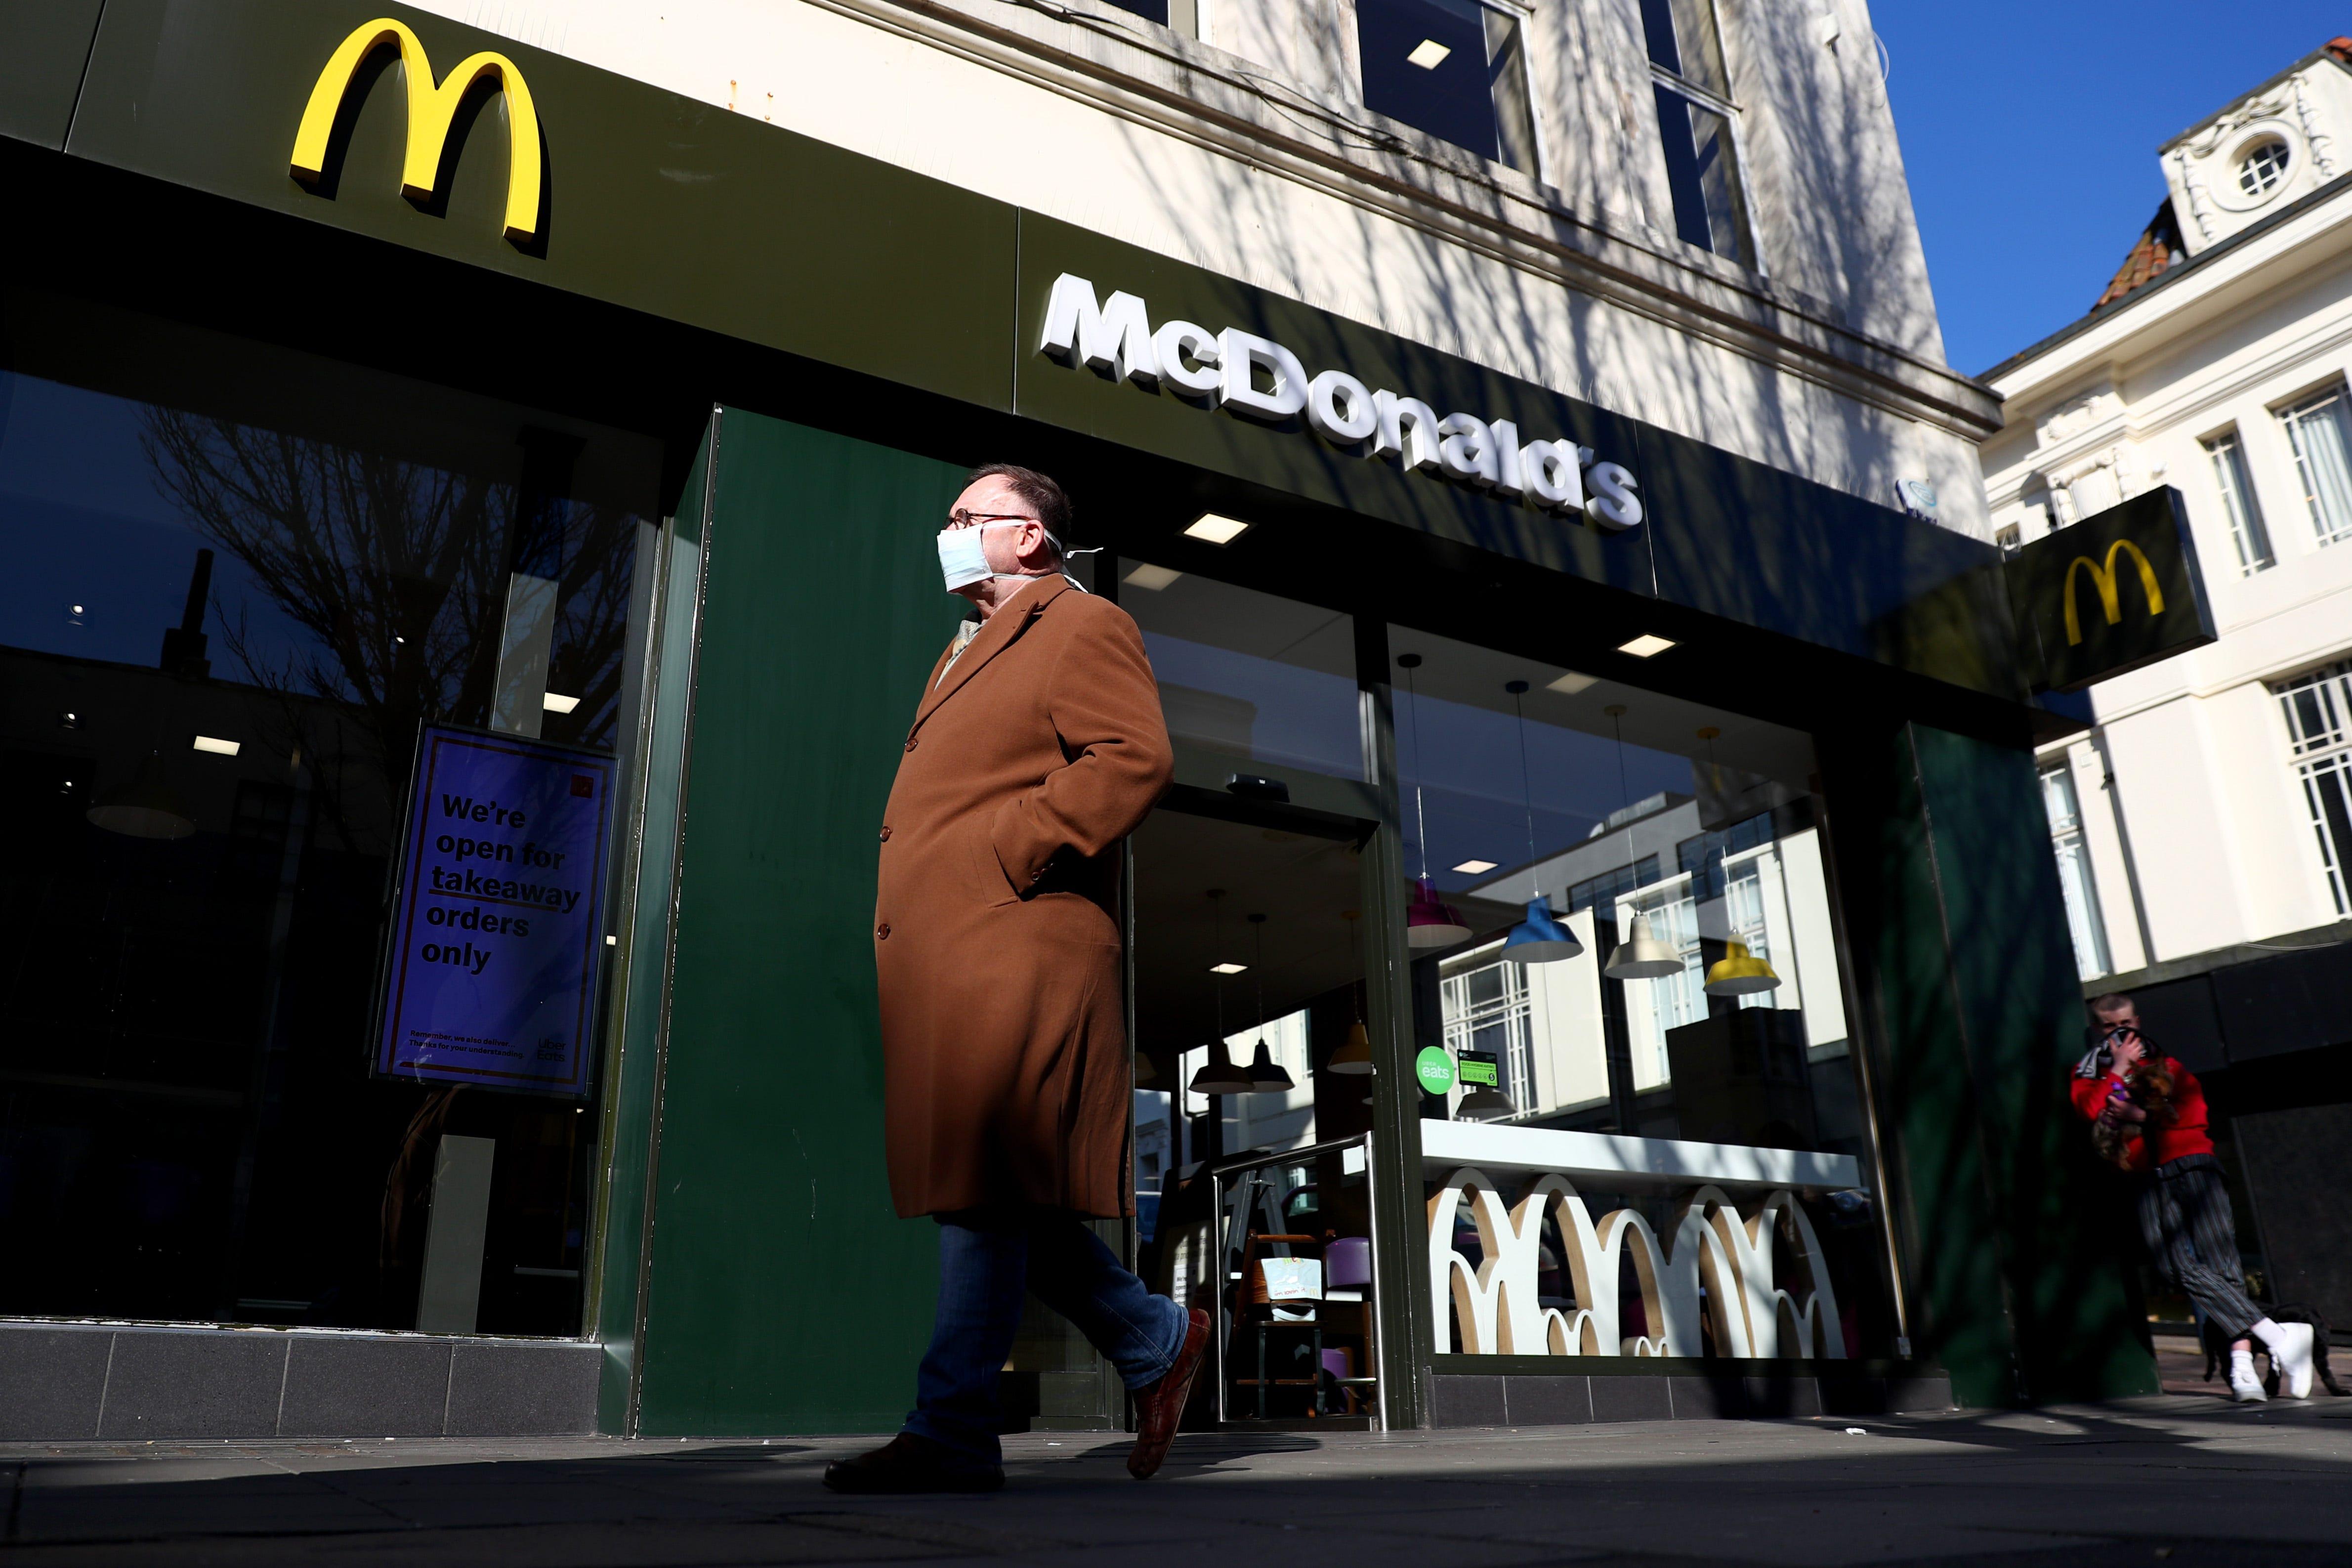 McDonald s pulls all-day breakfast menu to  simplify operations  amid coronavirus pandemic